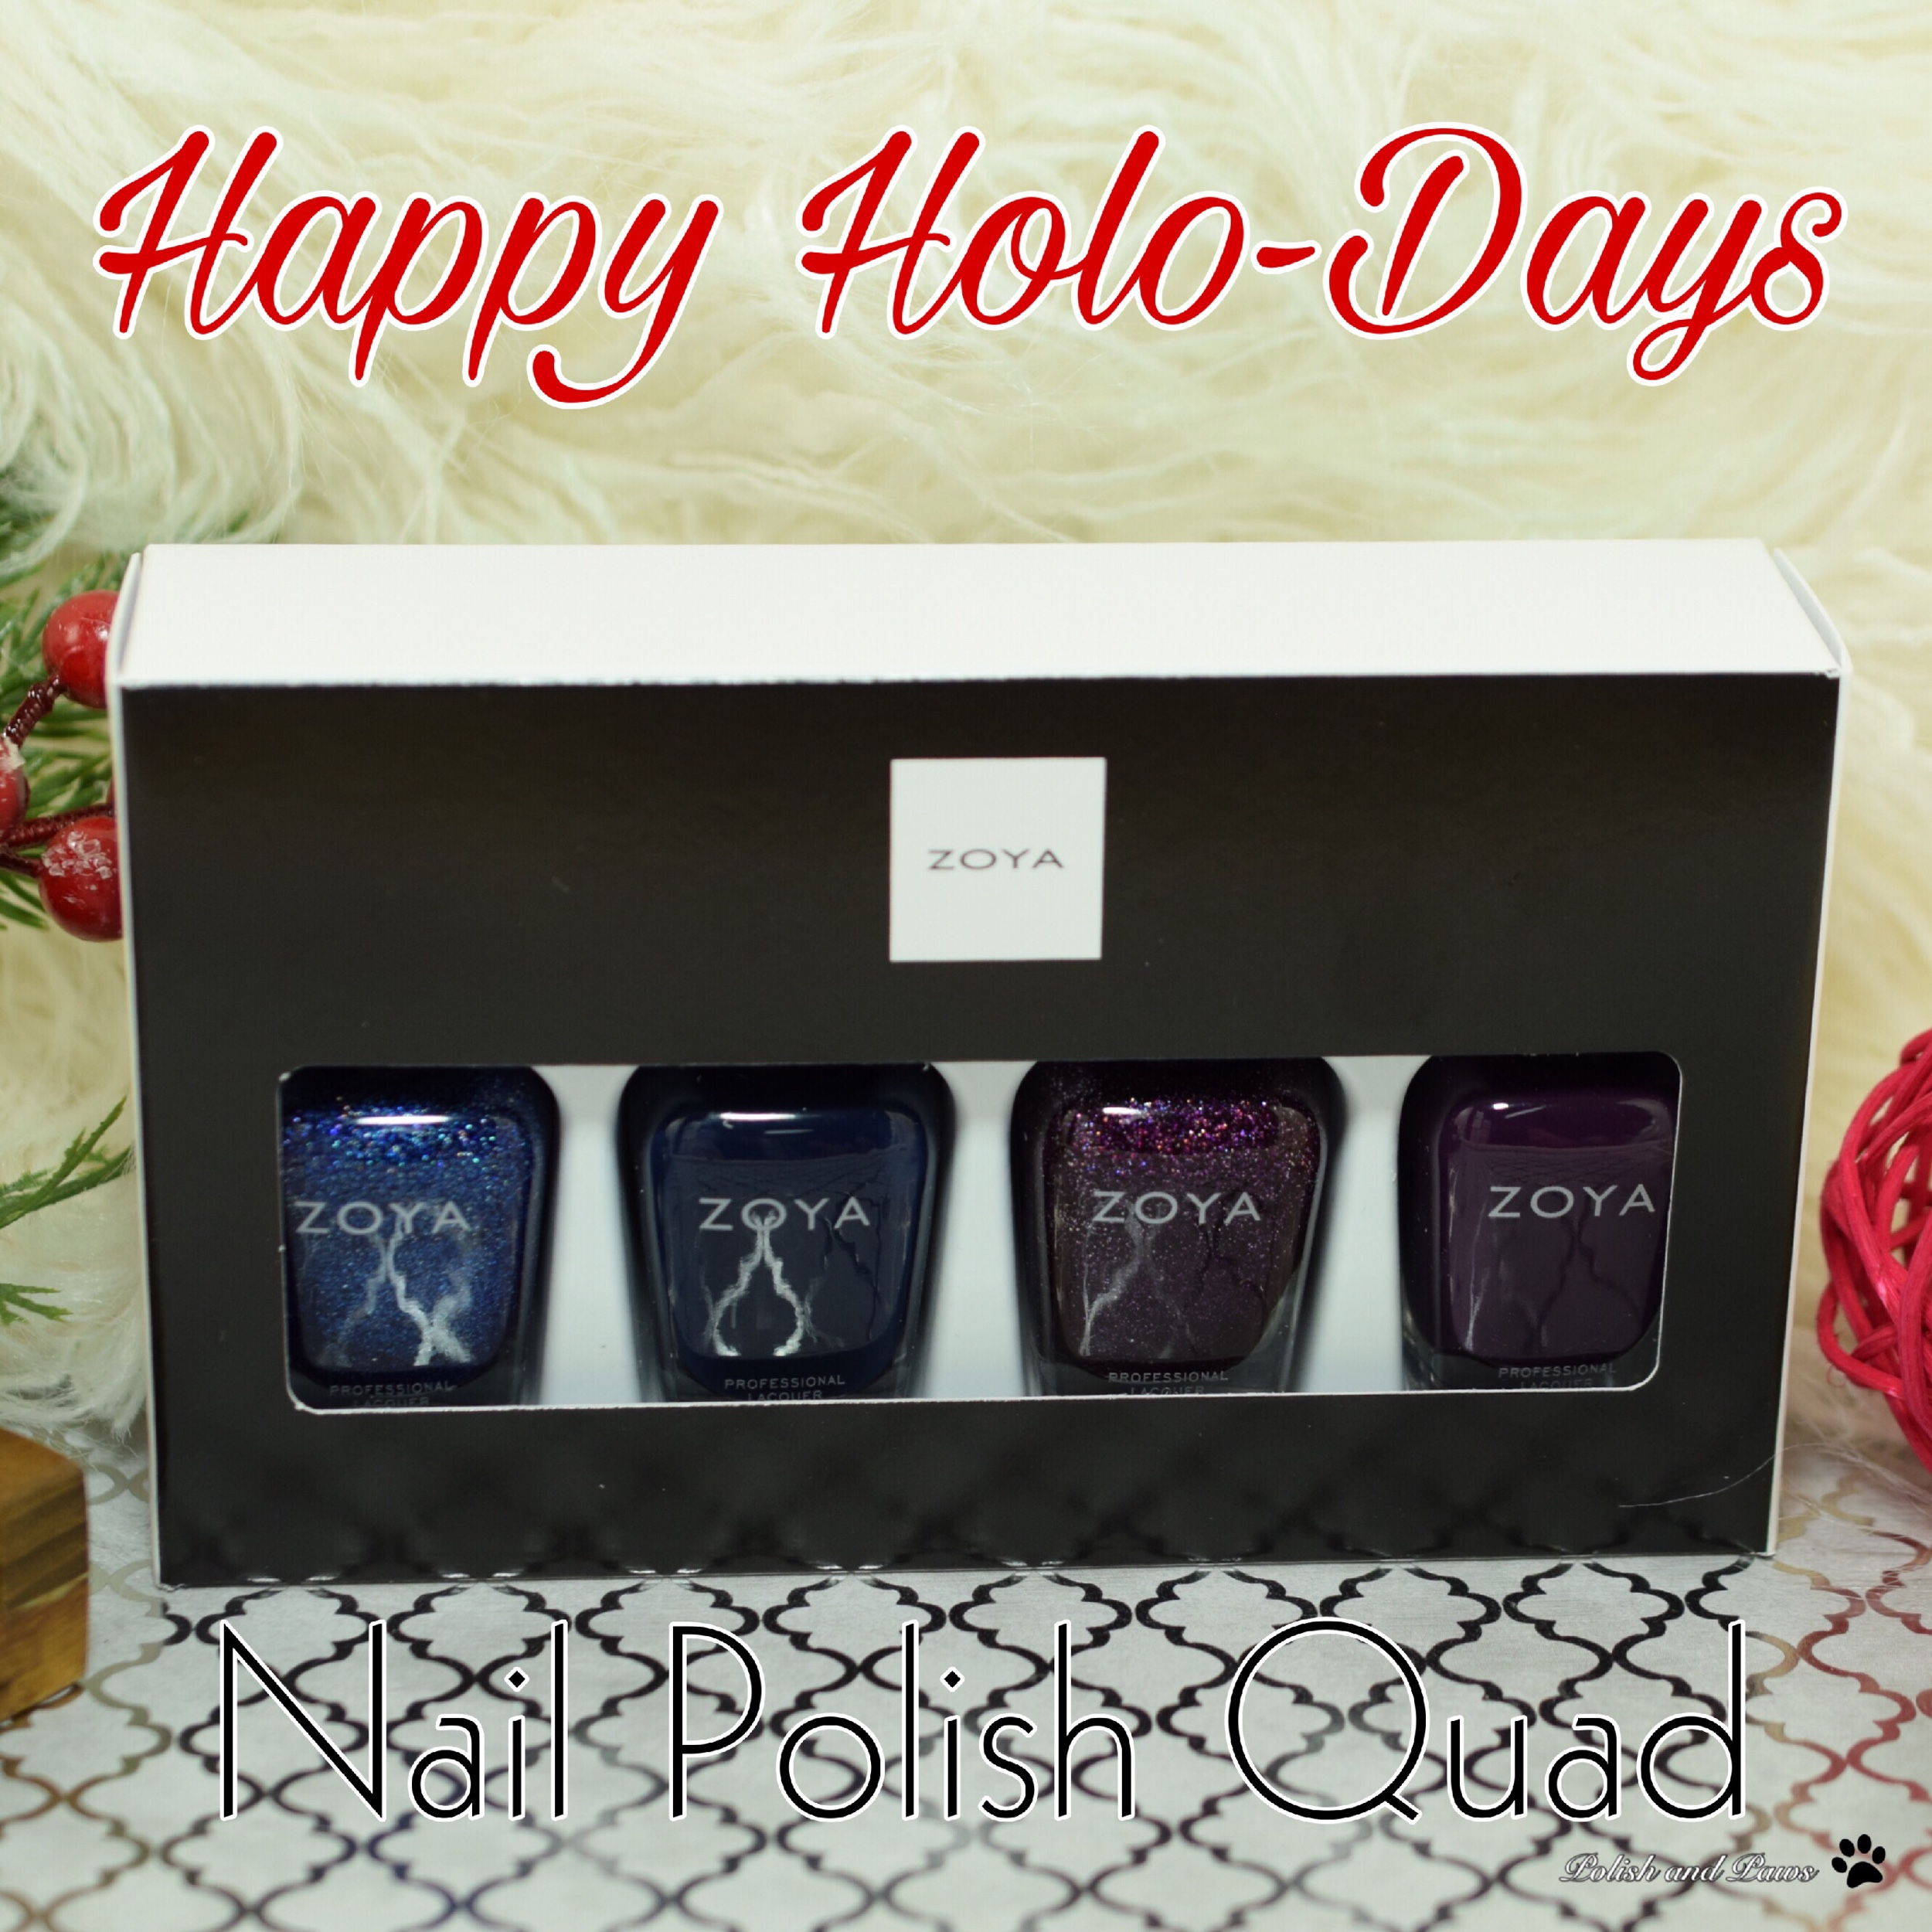 Zoya Happy Holo-Days Nail Polish Quad